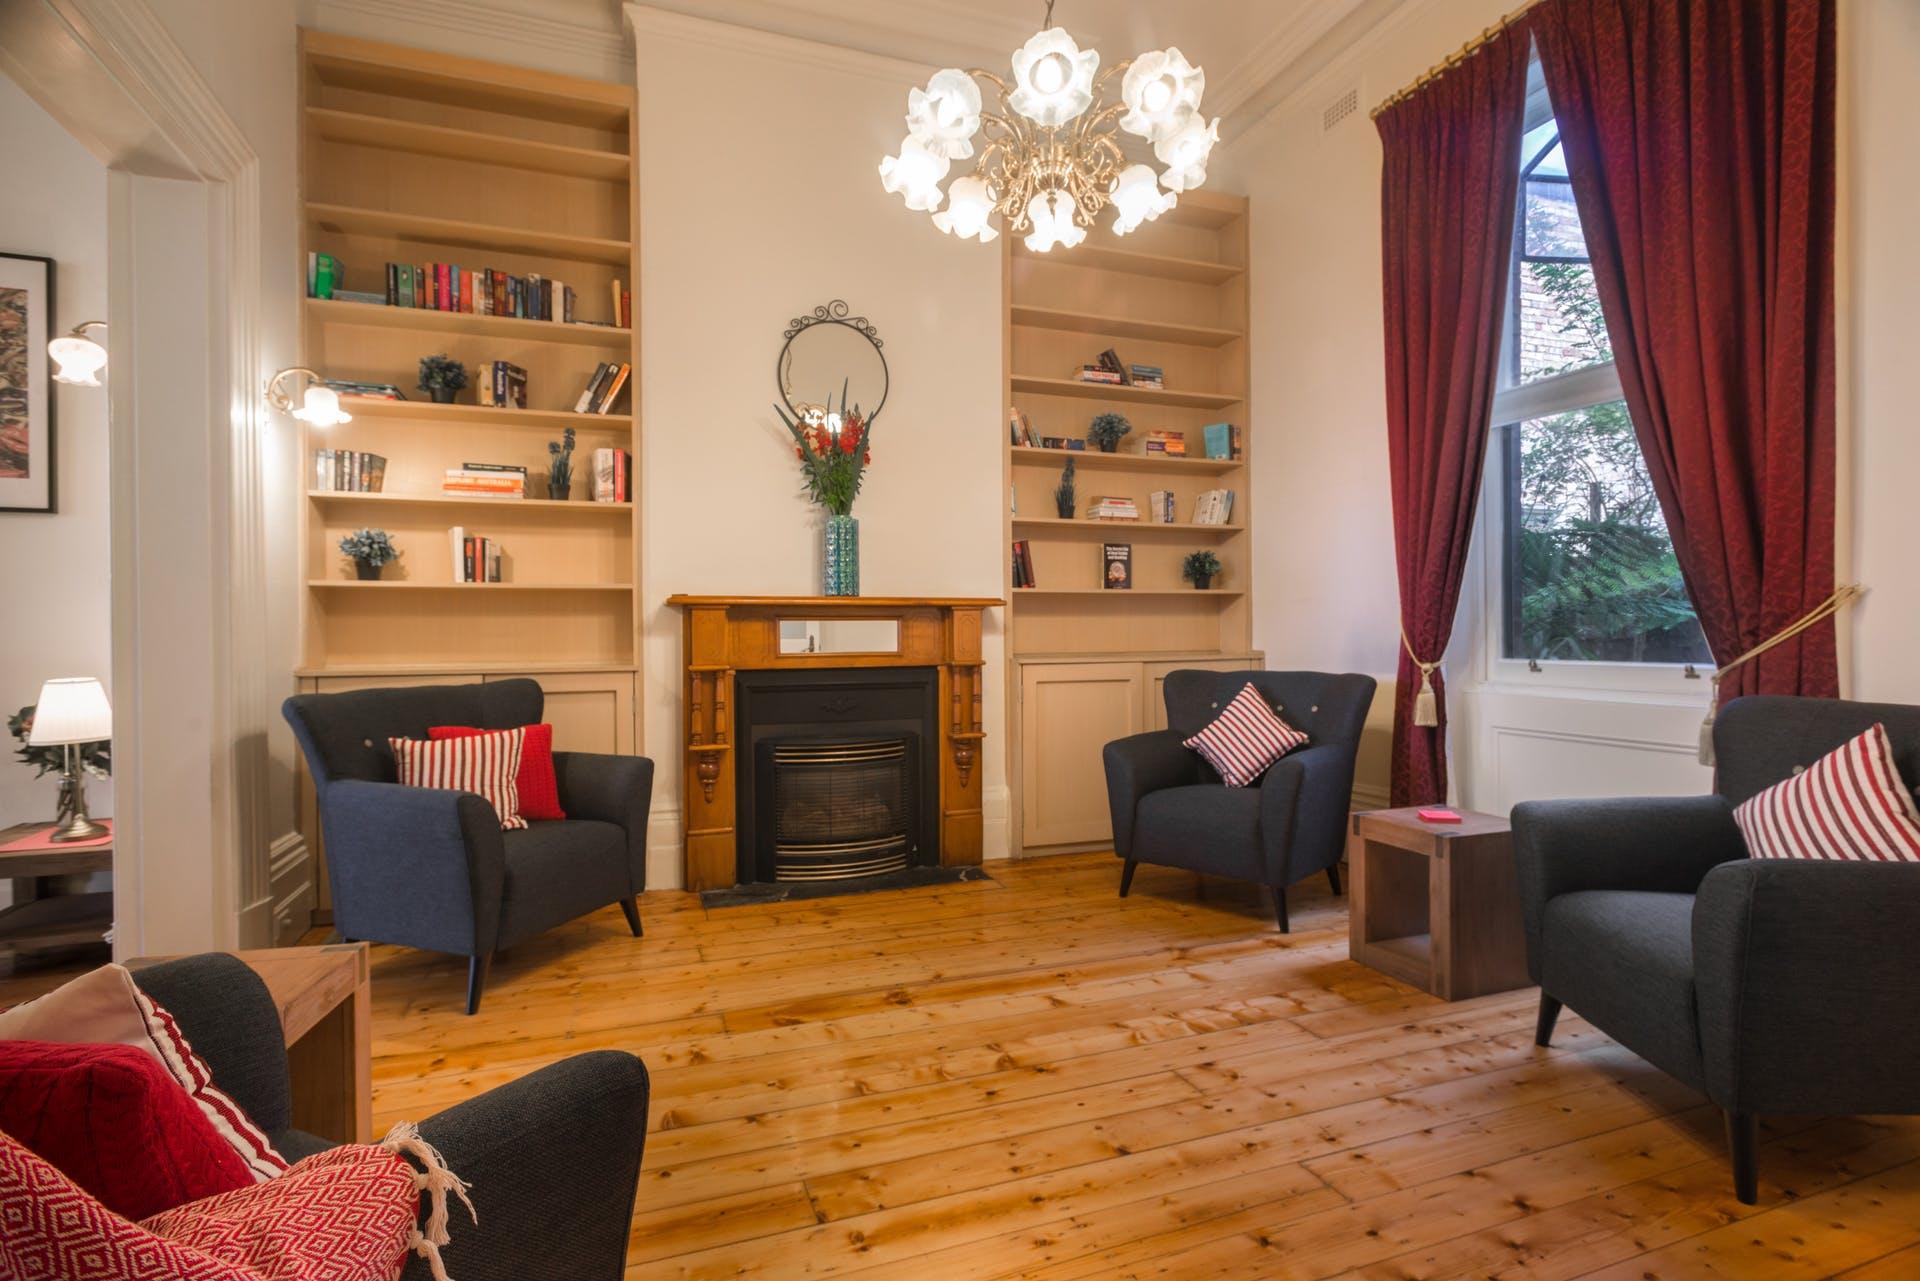 601-king-street-west-melbourne-student-accommodation-Melbourne-Living-Area-1-Unilodgers